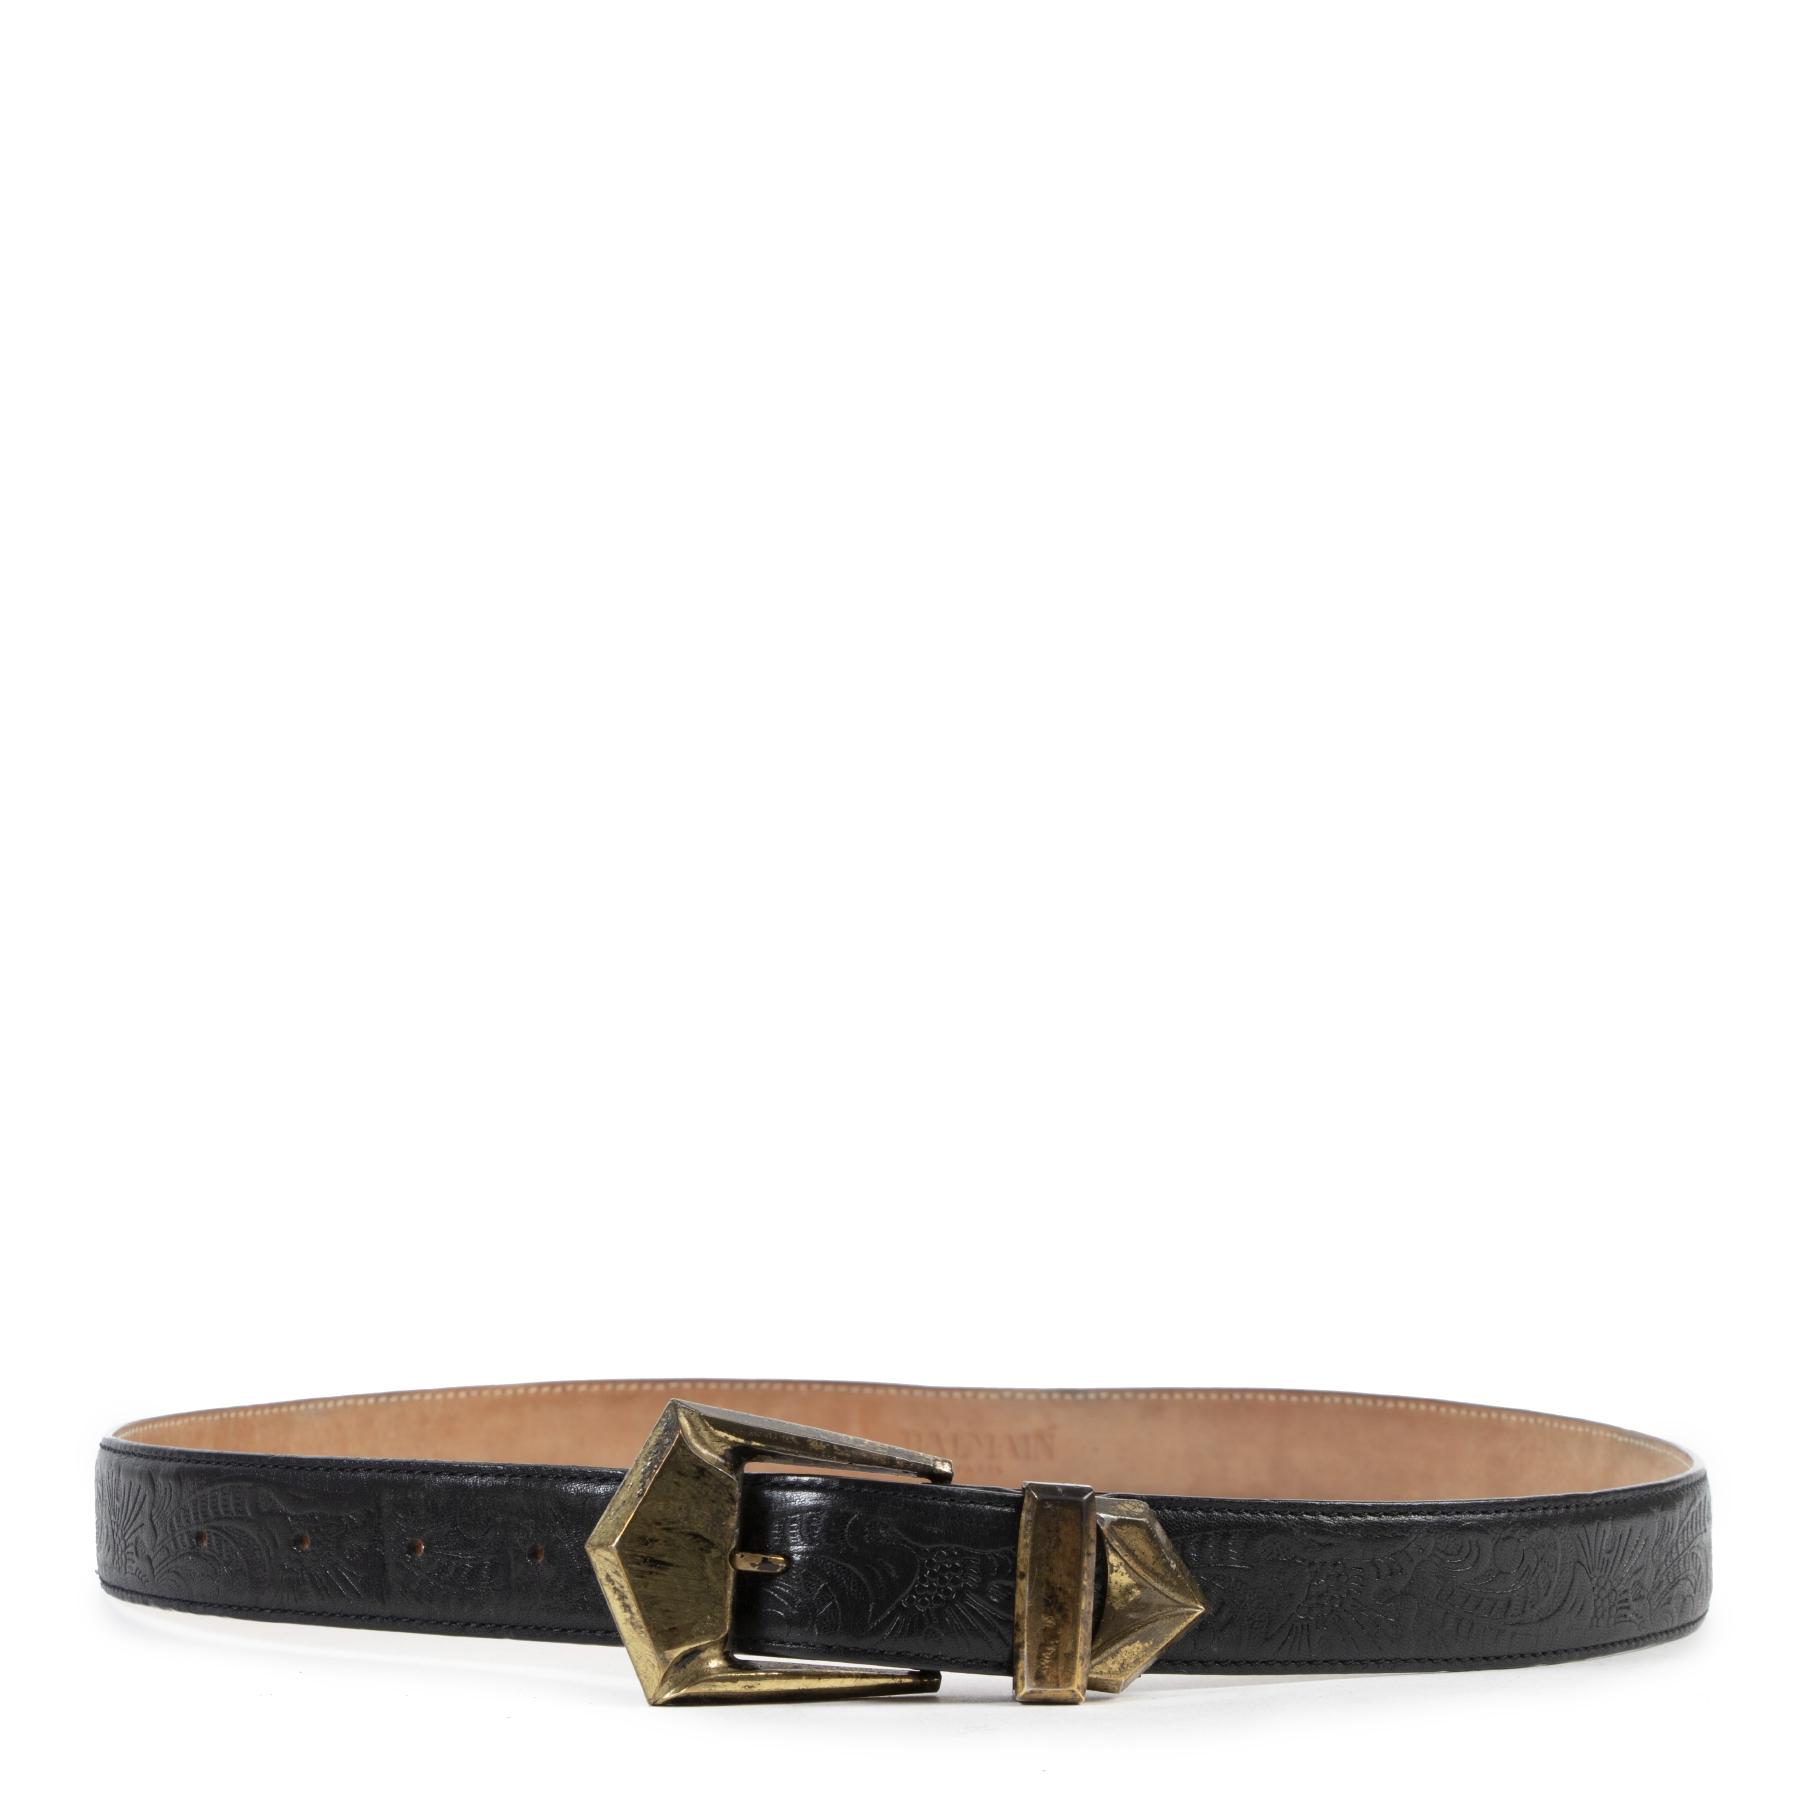 Authentic second-hand vintage Balmain Black Leather Belt - Size 38 buy online webshop LabelLOV